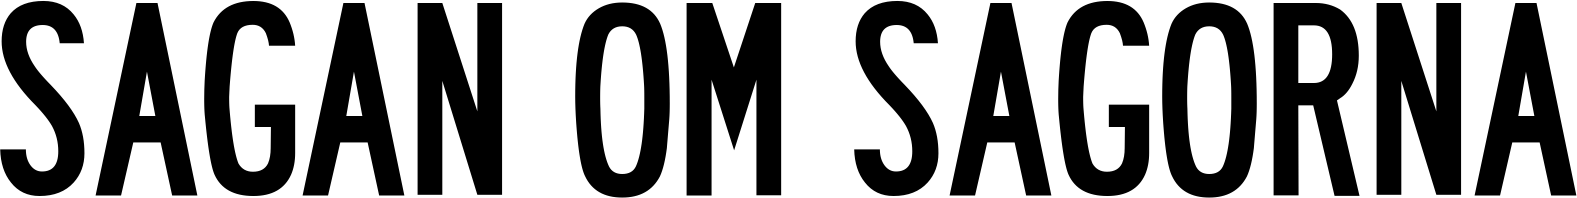 Sagan om Sagorna